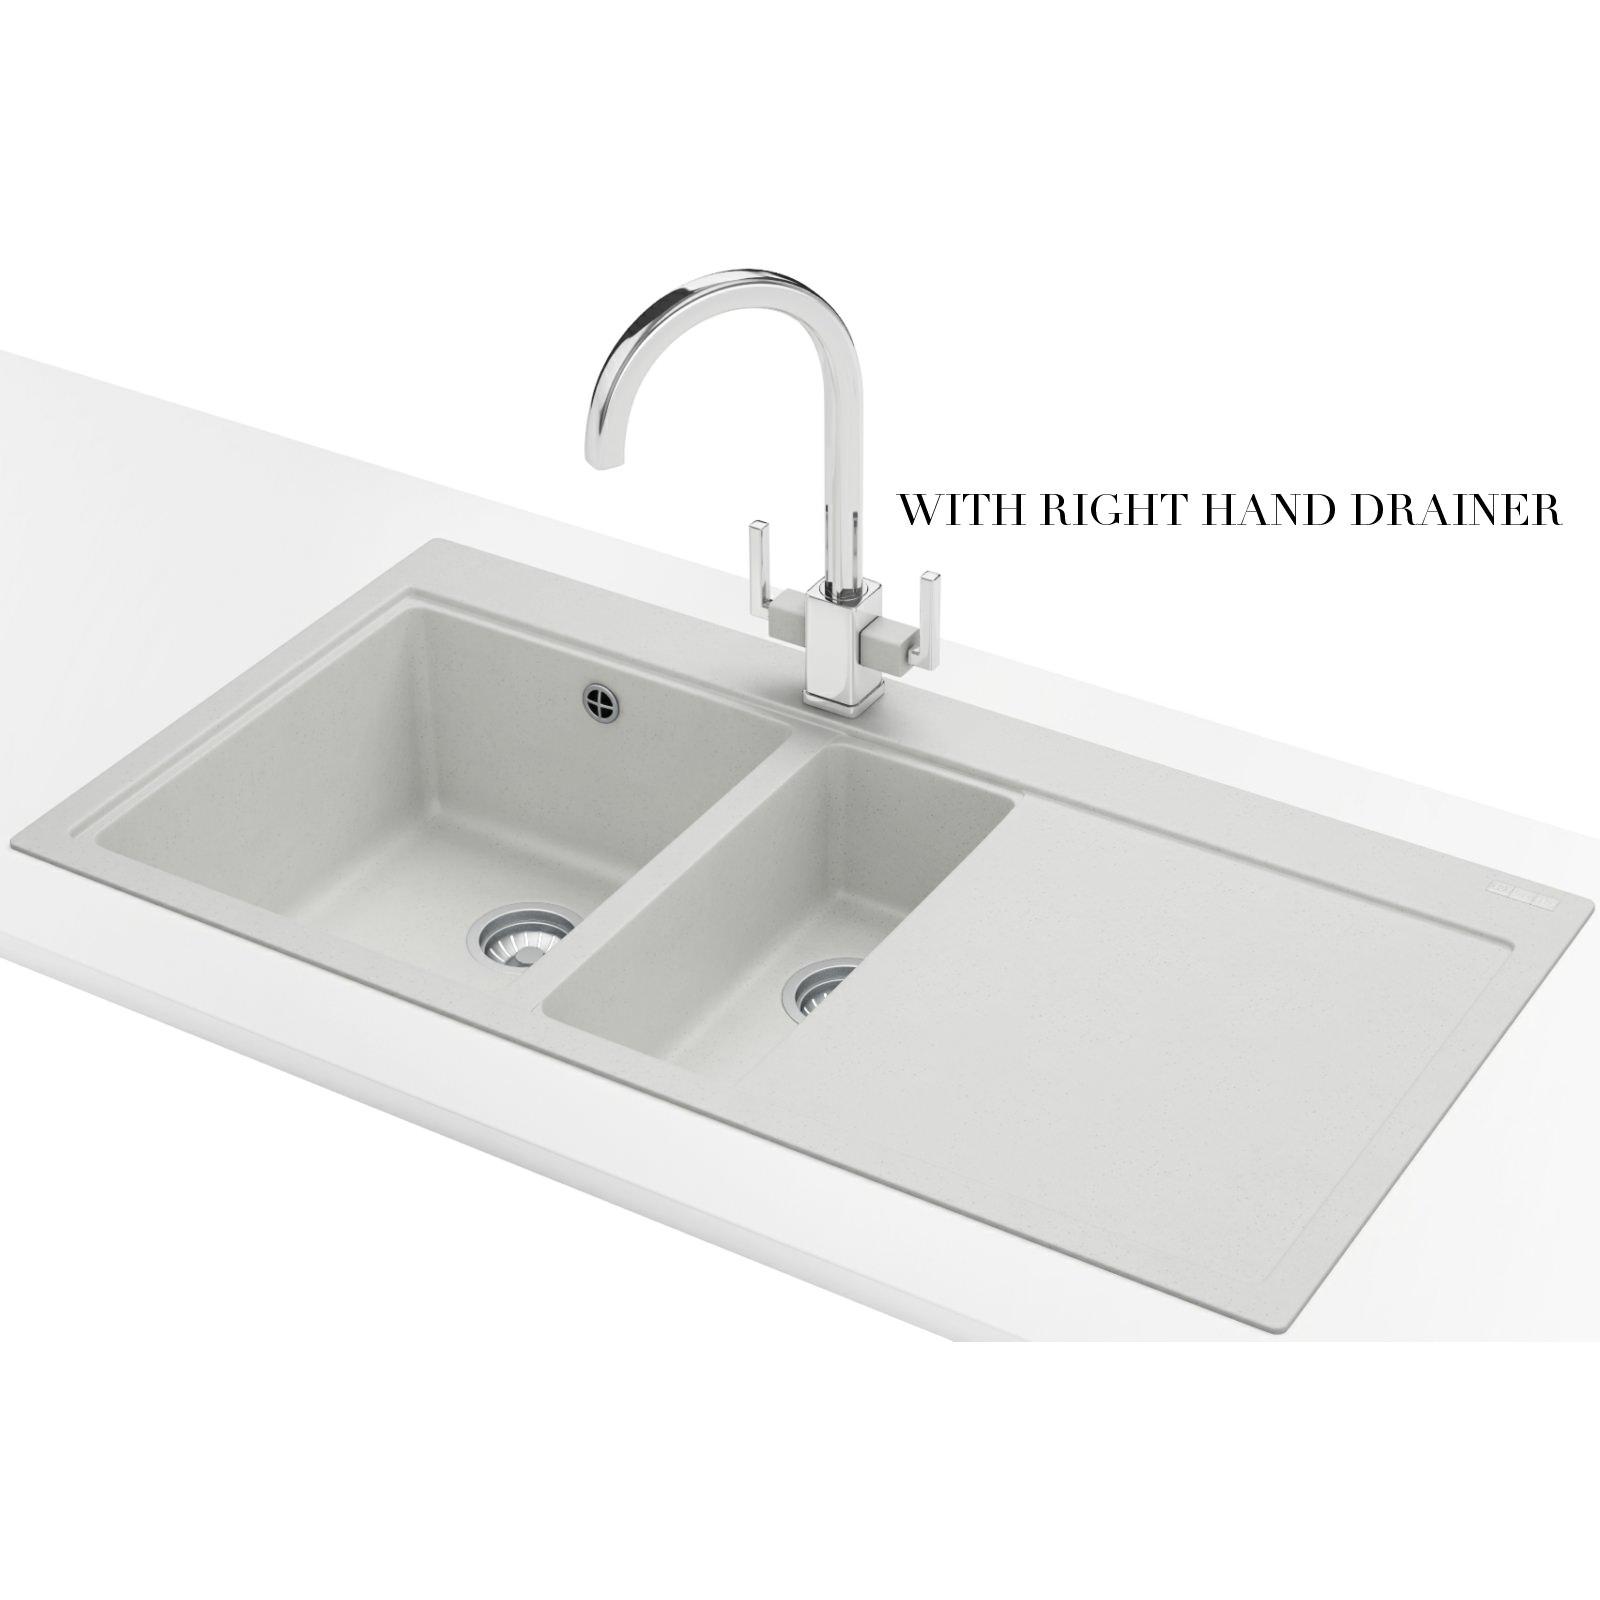 Franke Mythos Sink And Tap Pack : ... Franke Mythos Designer Pack MTG 651-100 Fragranite Polar White Sink